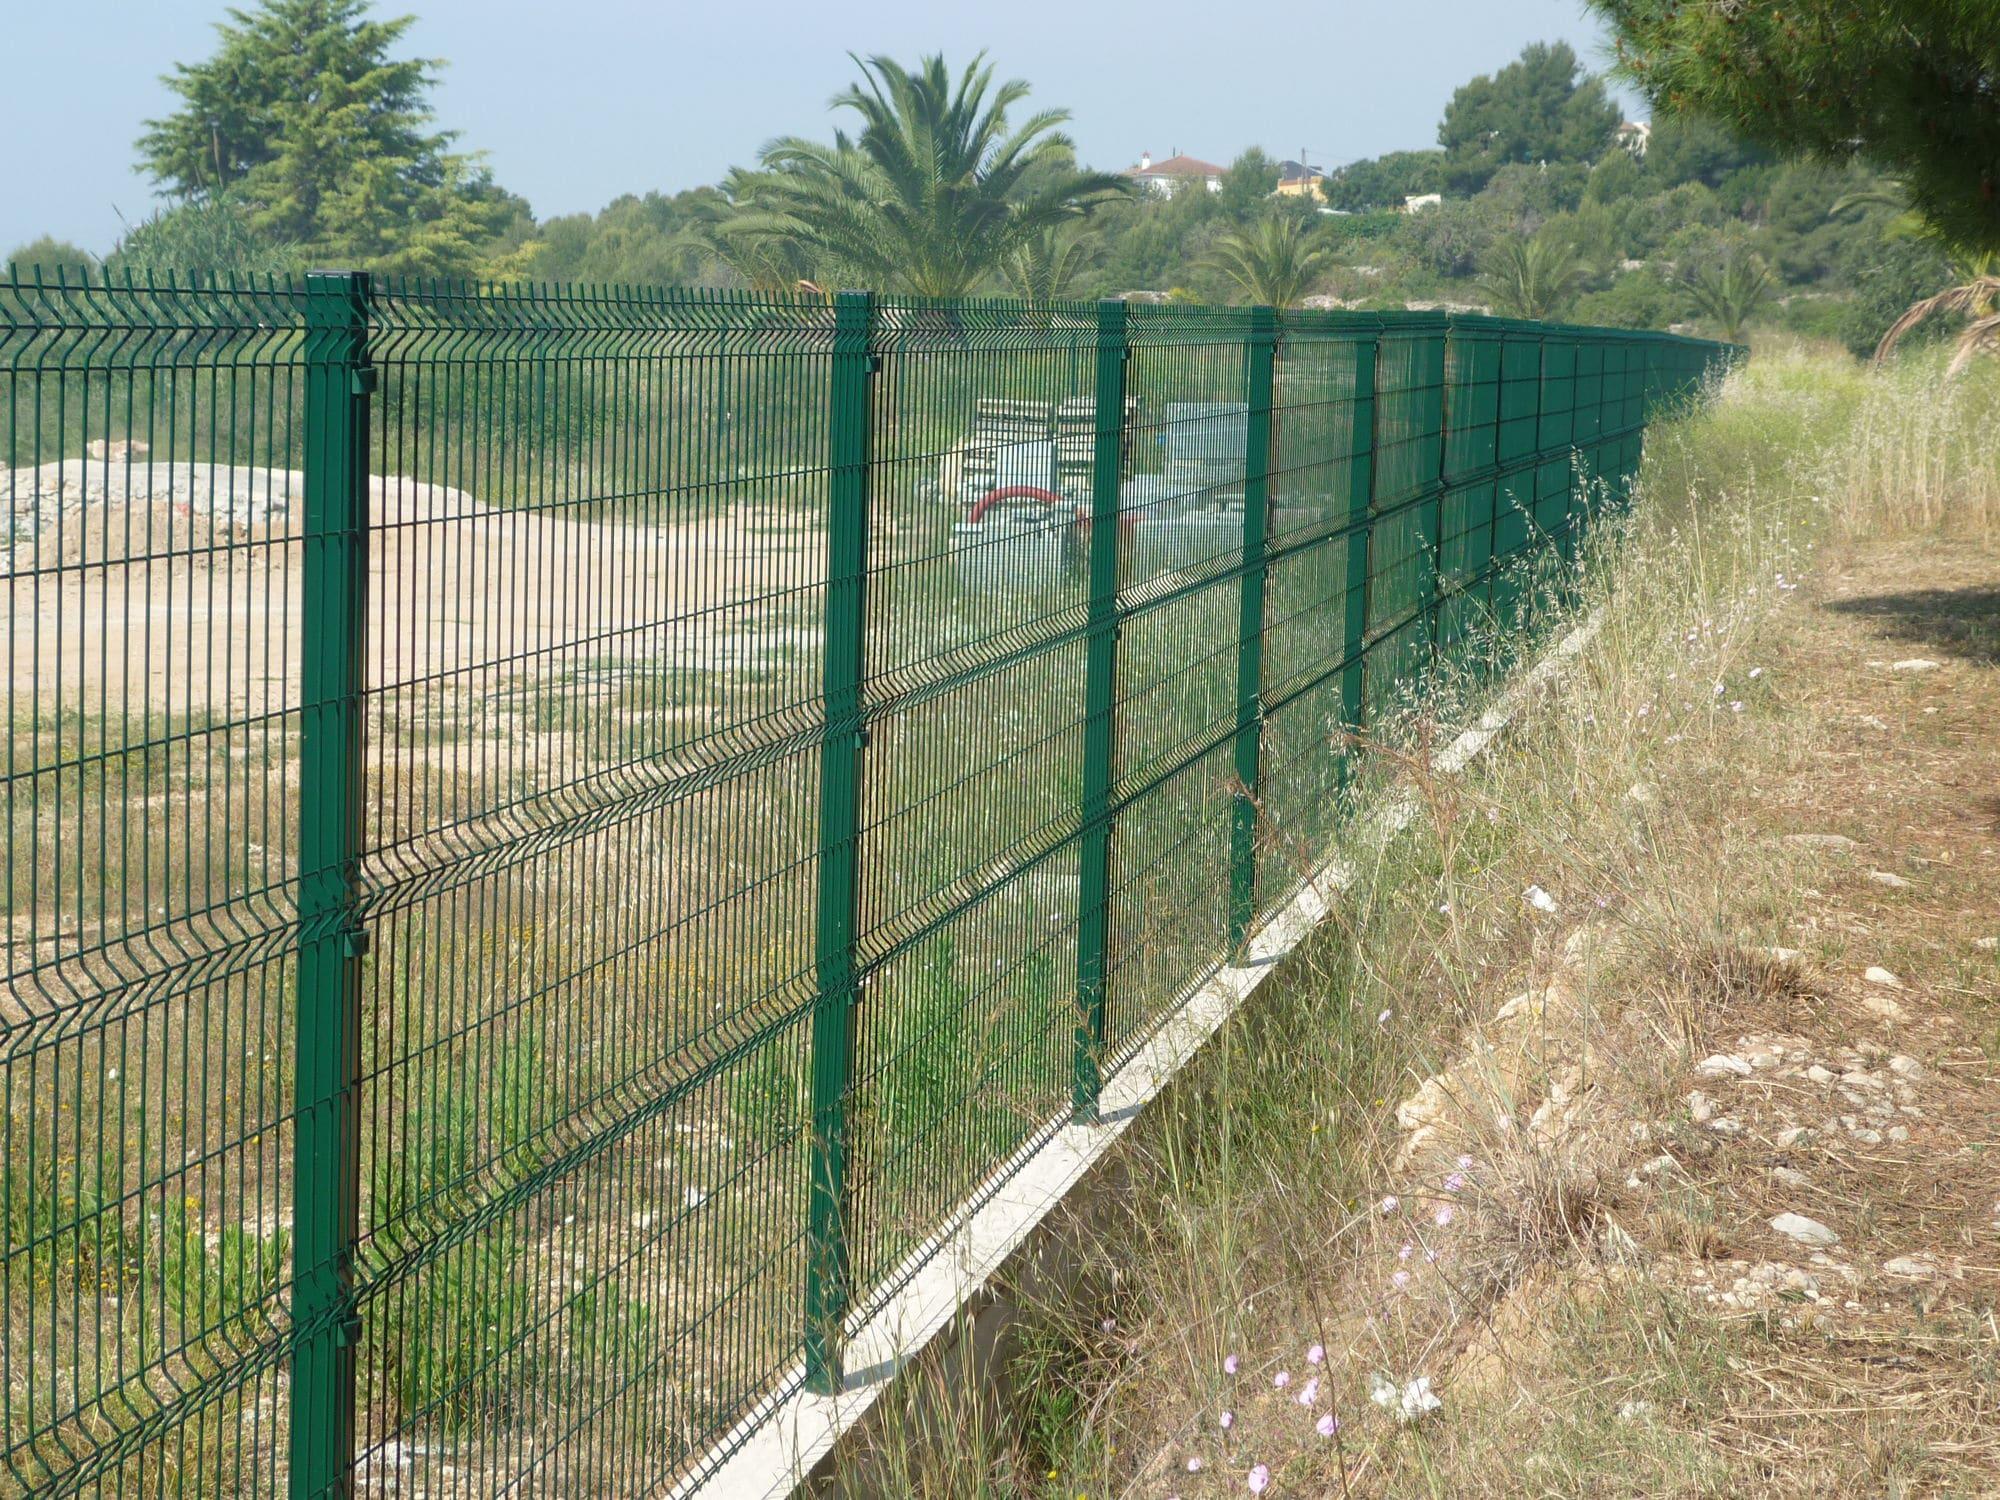 Recinzione Reti Per Giardino.Recinzione Da Giardino Panneau A Plis Indusmetal Torres Per